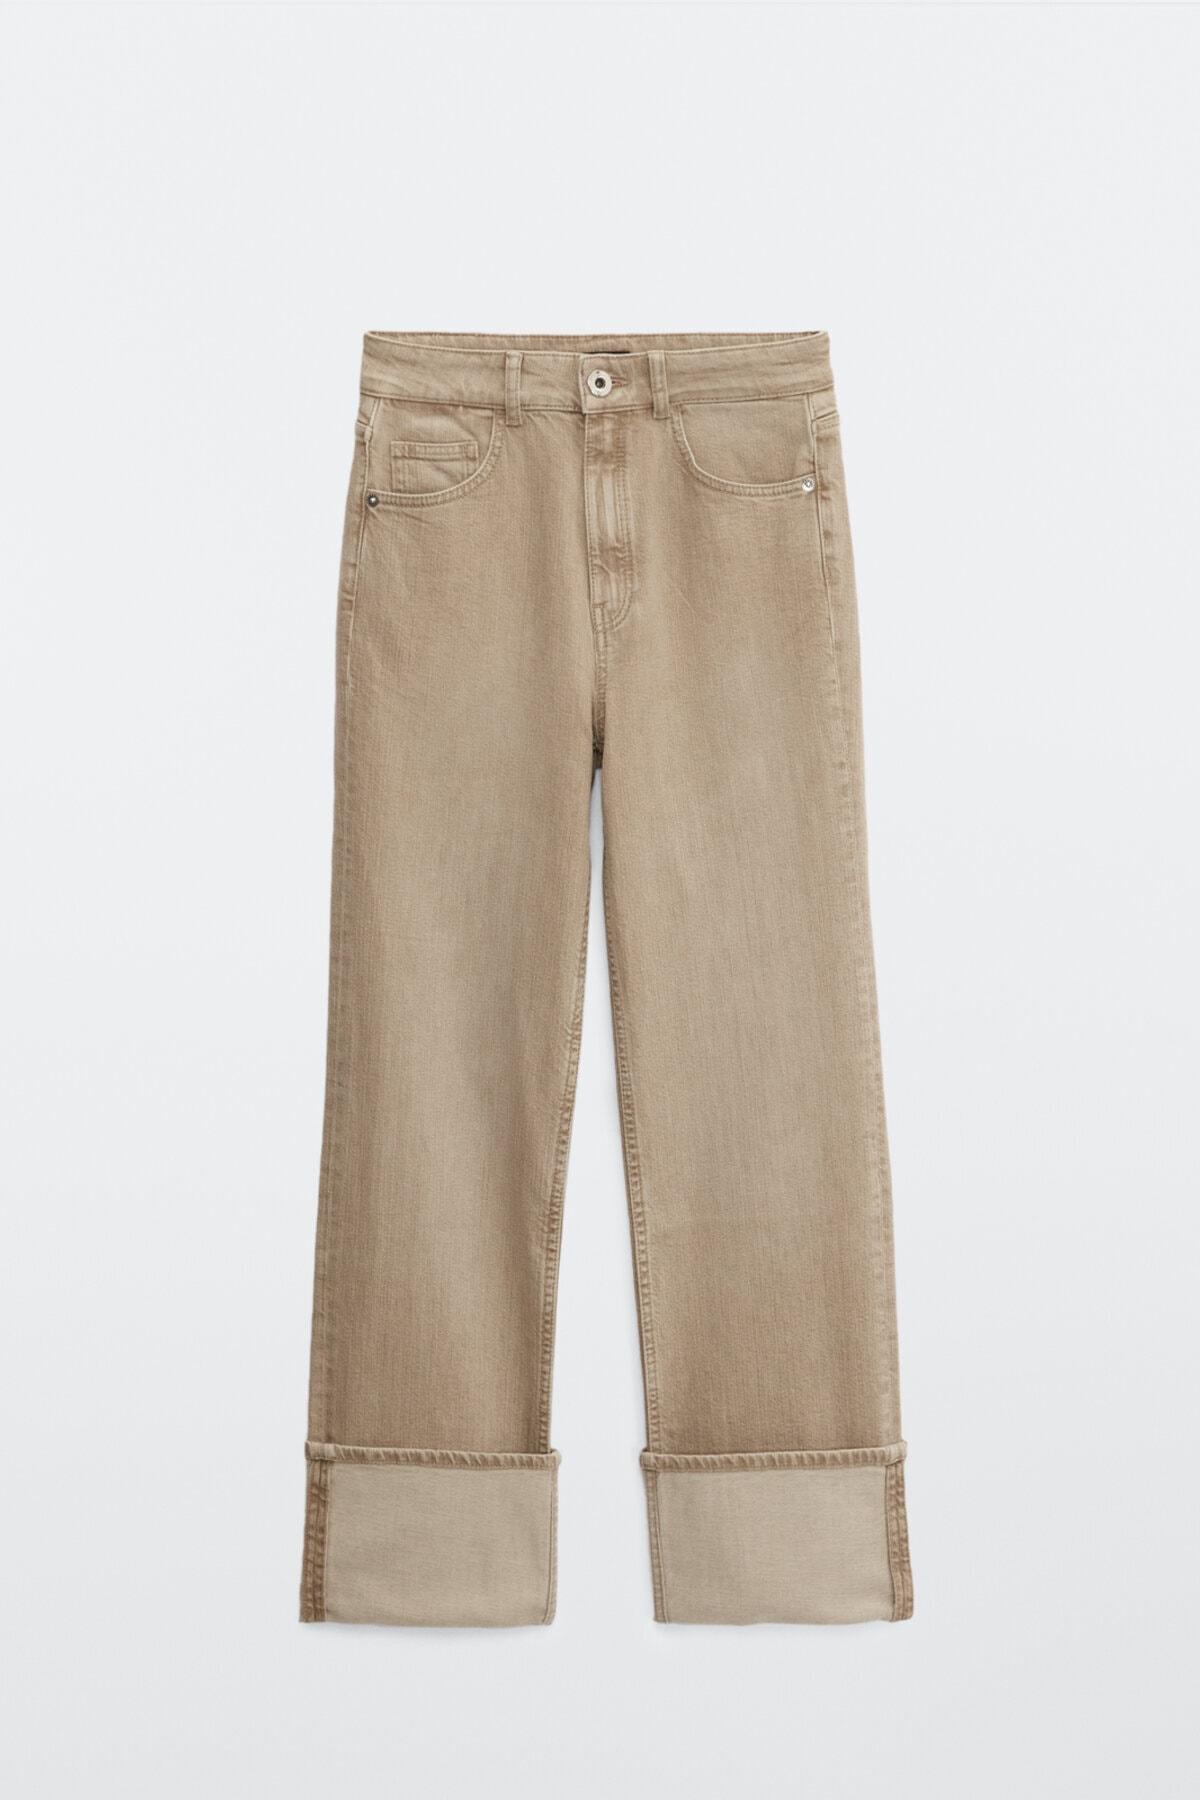 Massimo Dutti Kadın Kıvrık Paça Straight Fit Jean 05079661